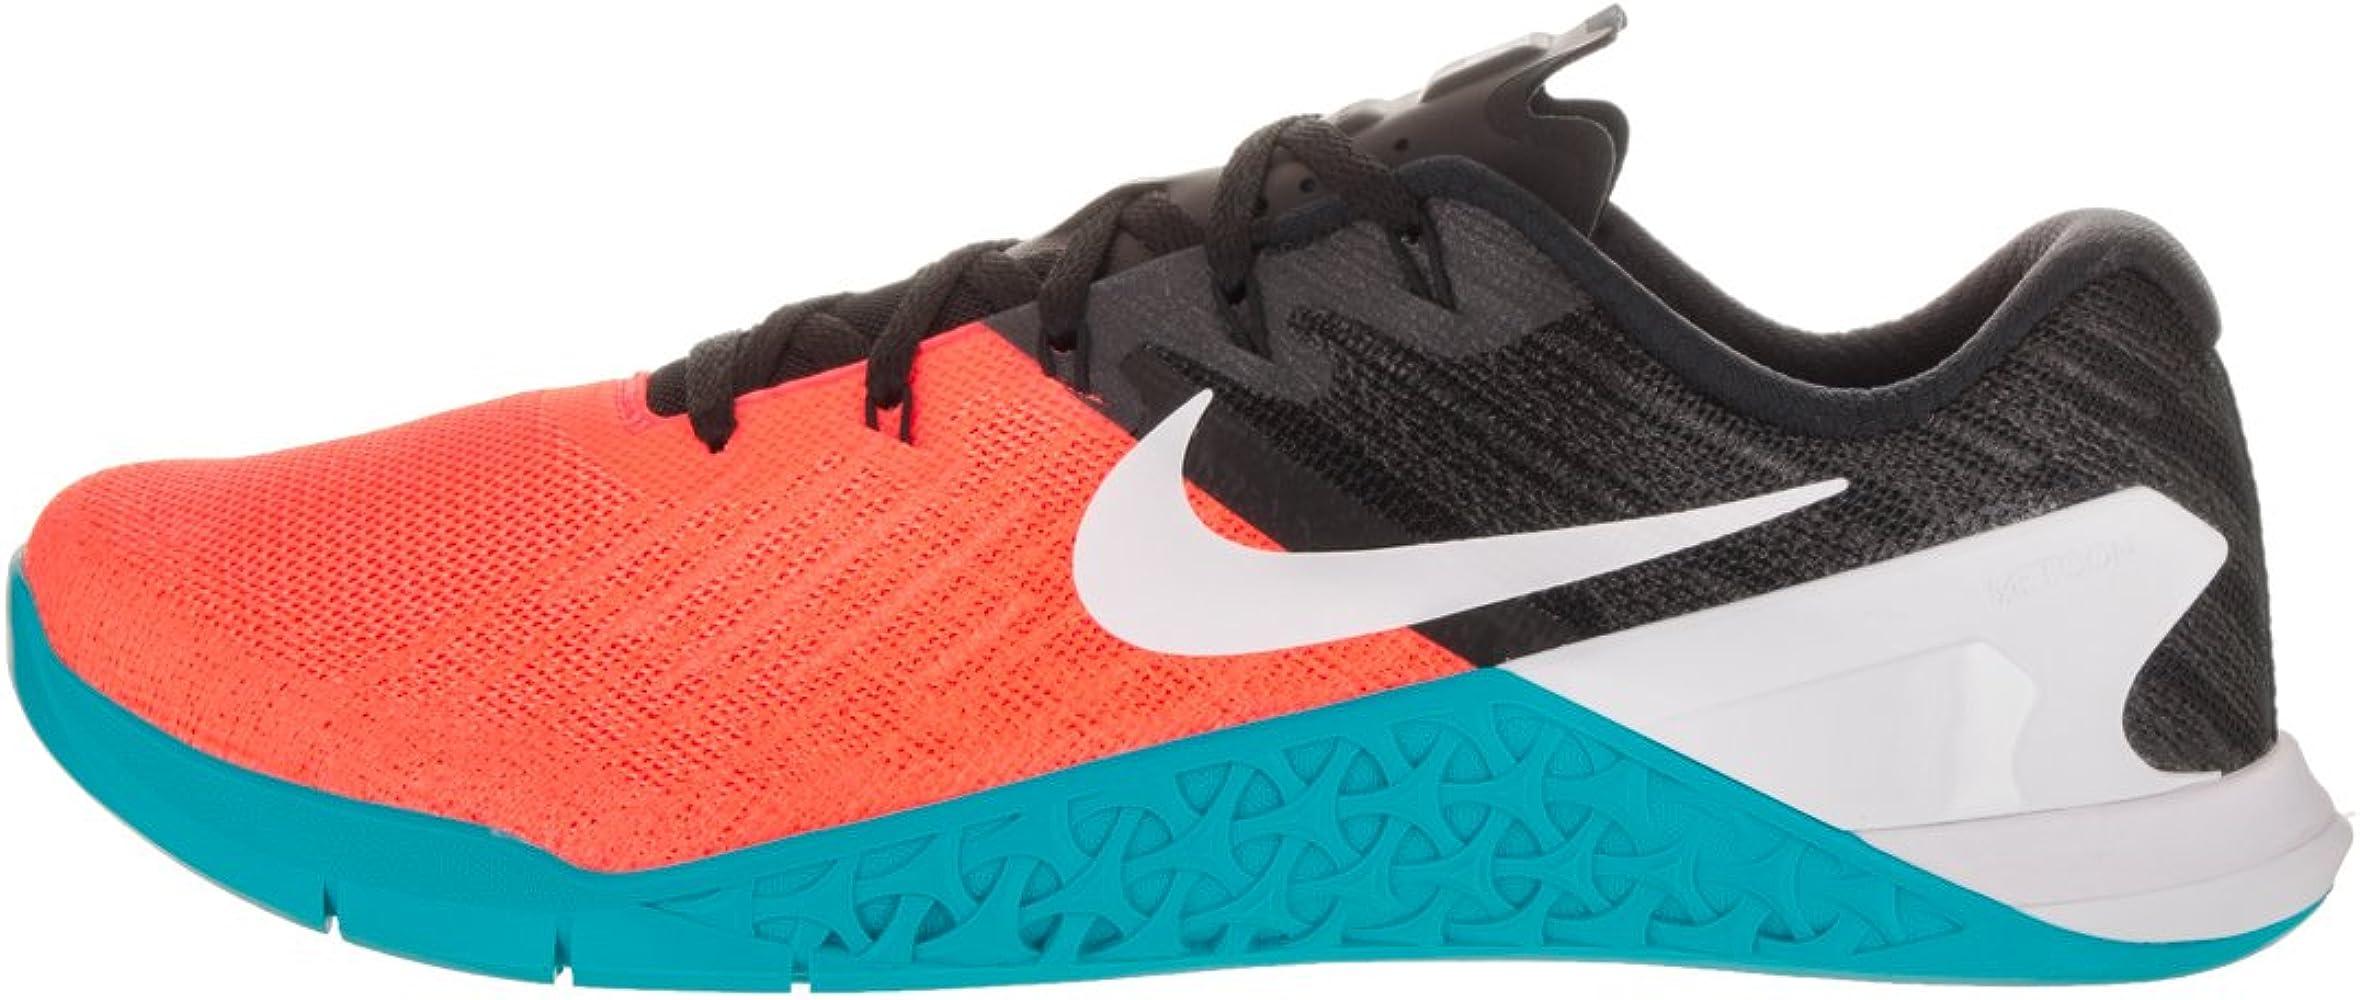 Nike Te CH - Mallas deportivas para hombre, color Naranja, talla ...